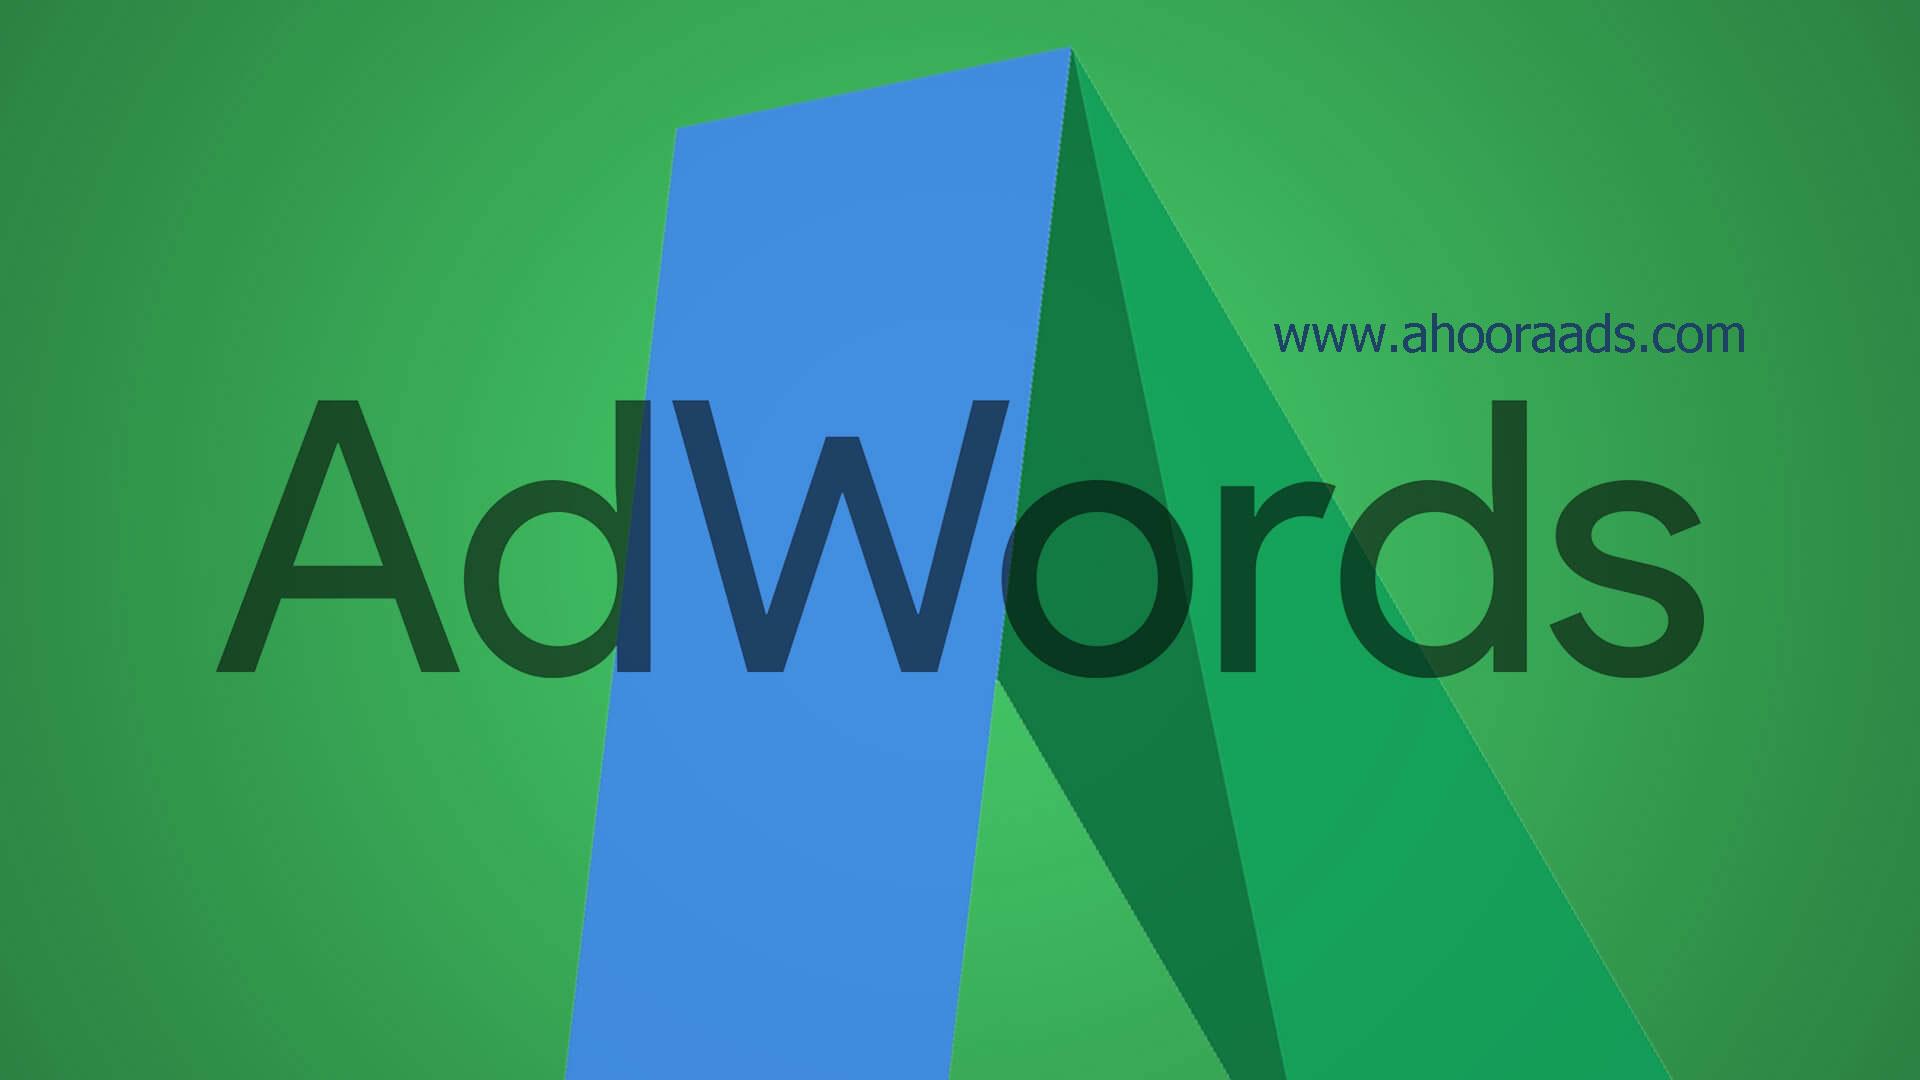 تبلیغات-گوگلی--02188396574-اهورا-ادز